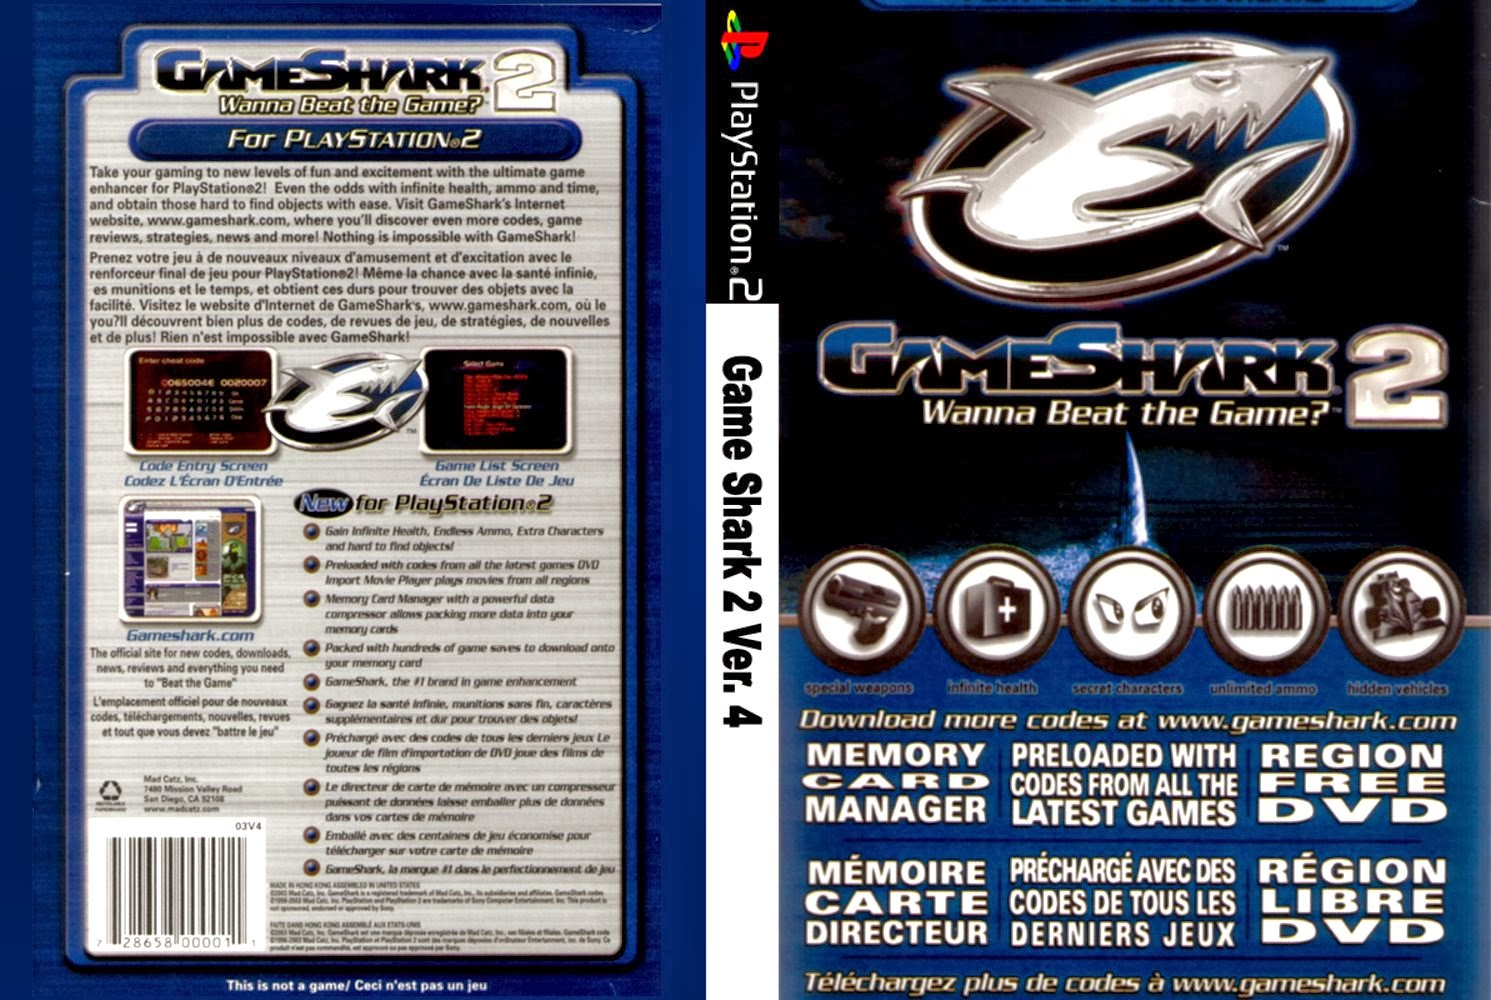 game shark play station 2: